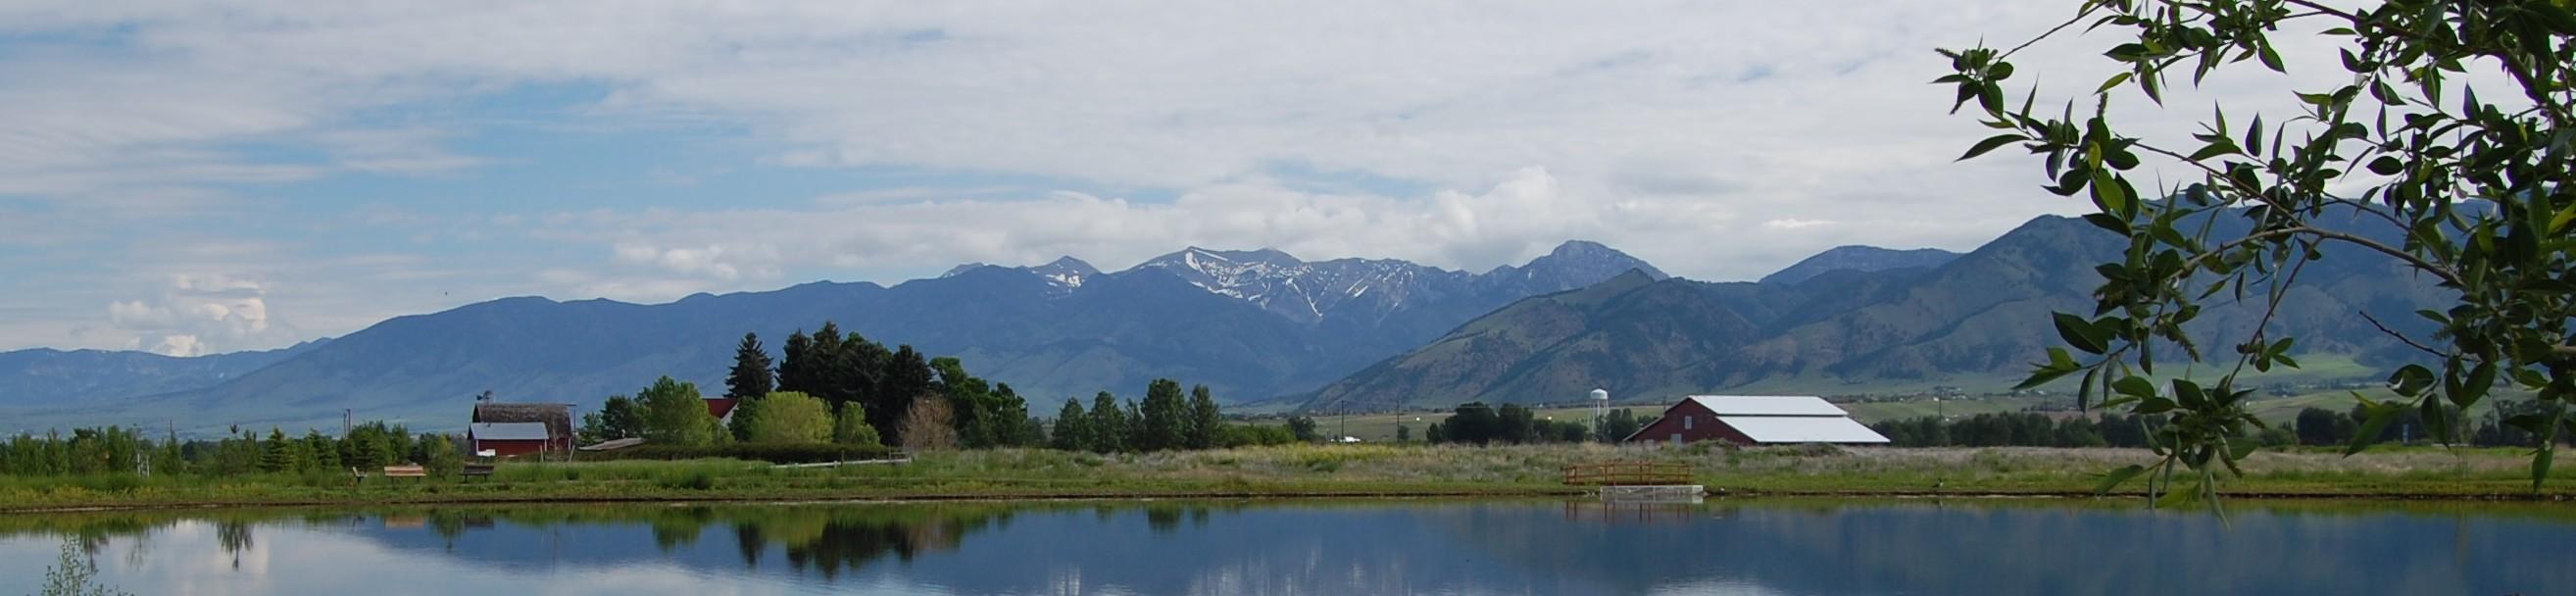 Montana Homestead Declaration